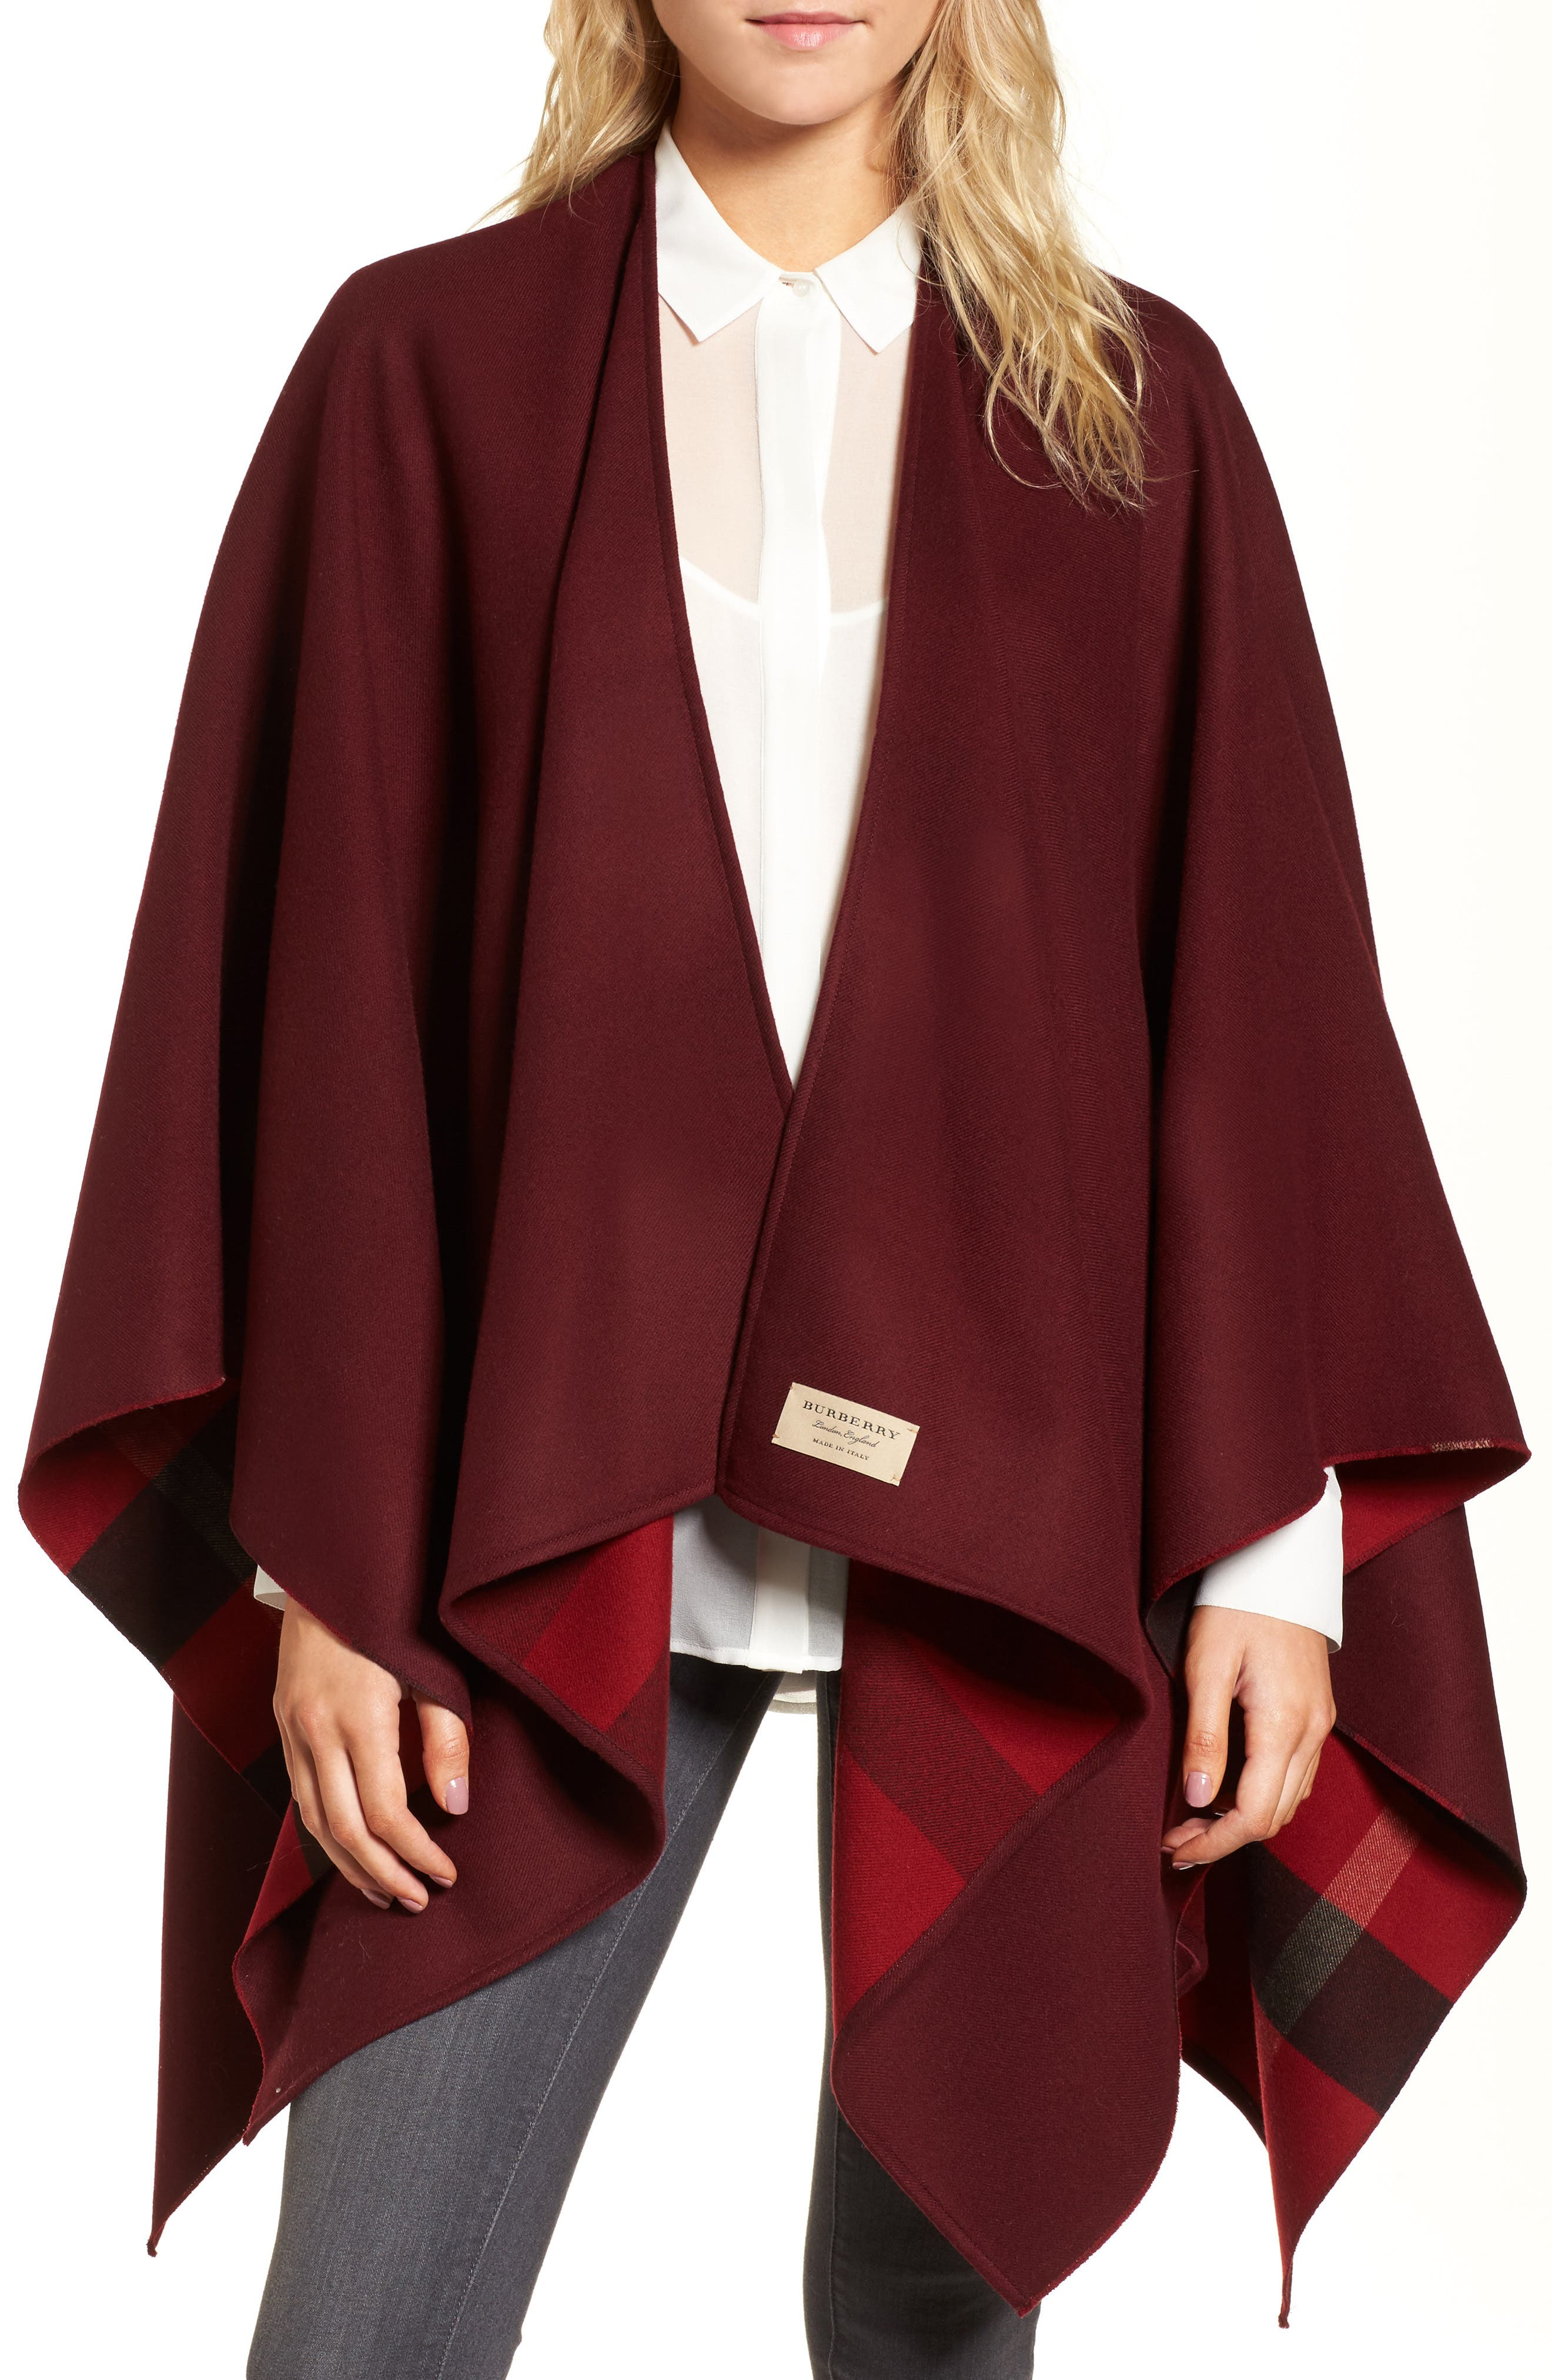 Merino Wool Reversible Wrap,                             Main thumbnail 1, color,                             Parade Red